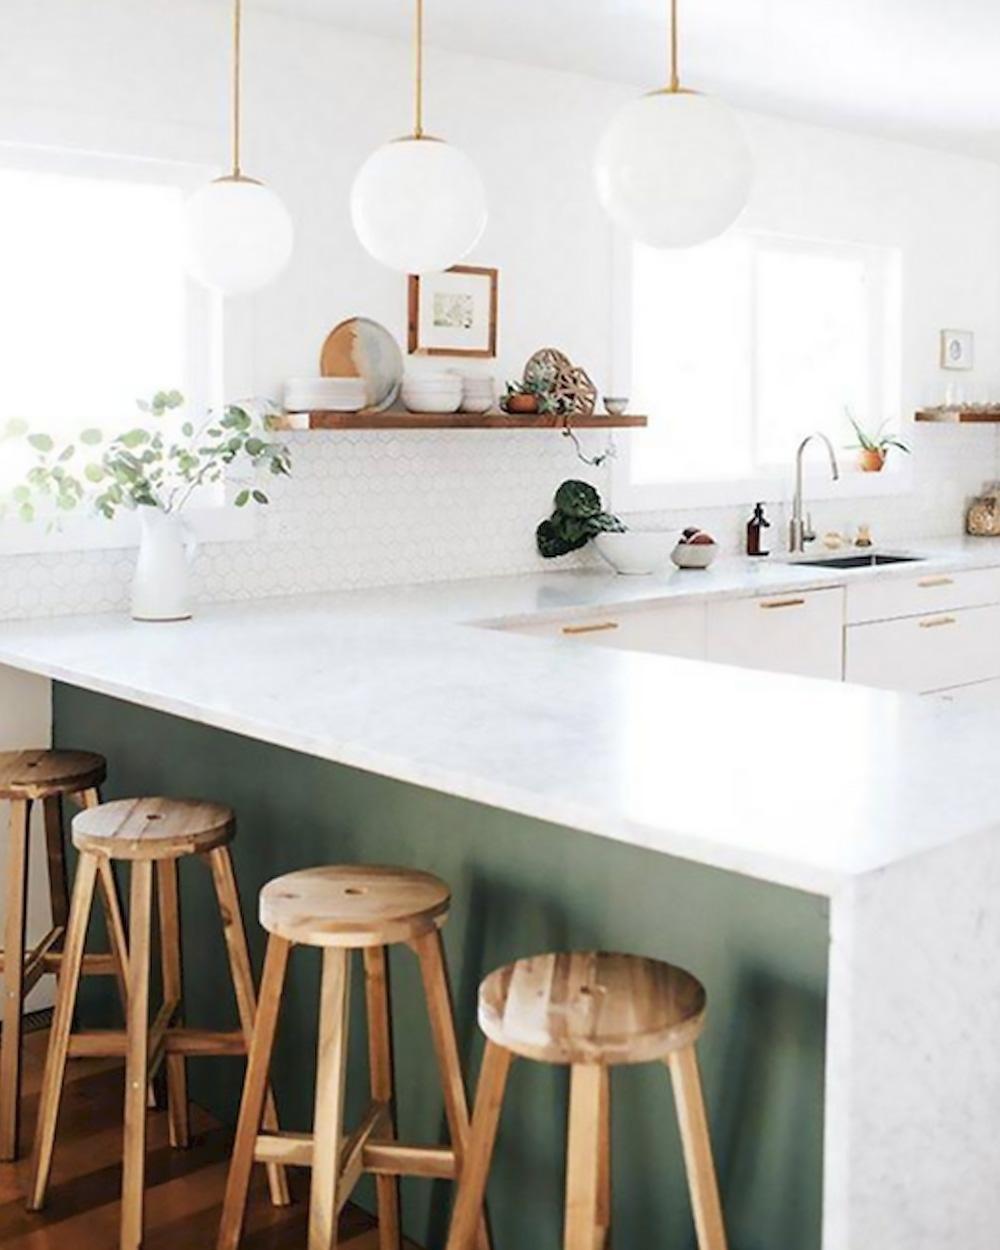 cuisine vert olive affordable comment choisir le bon vert pour ses murs with cuisine vert olive. Black Bedroom Furniture Sets. Home Design Ideas